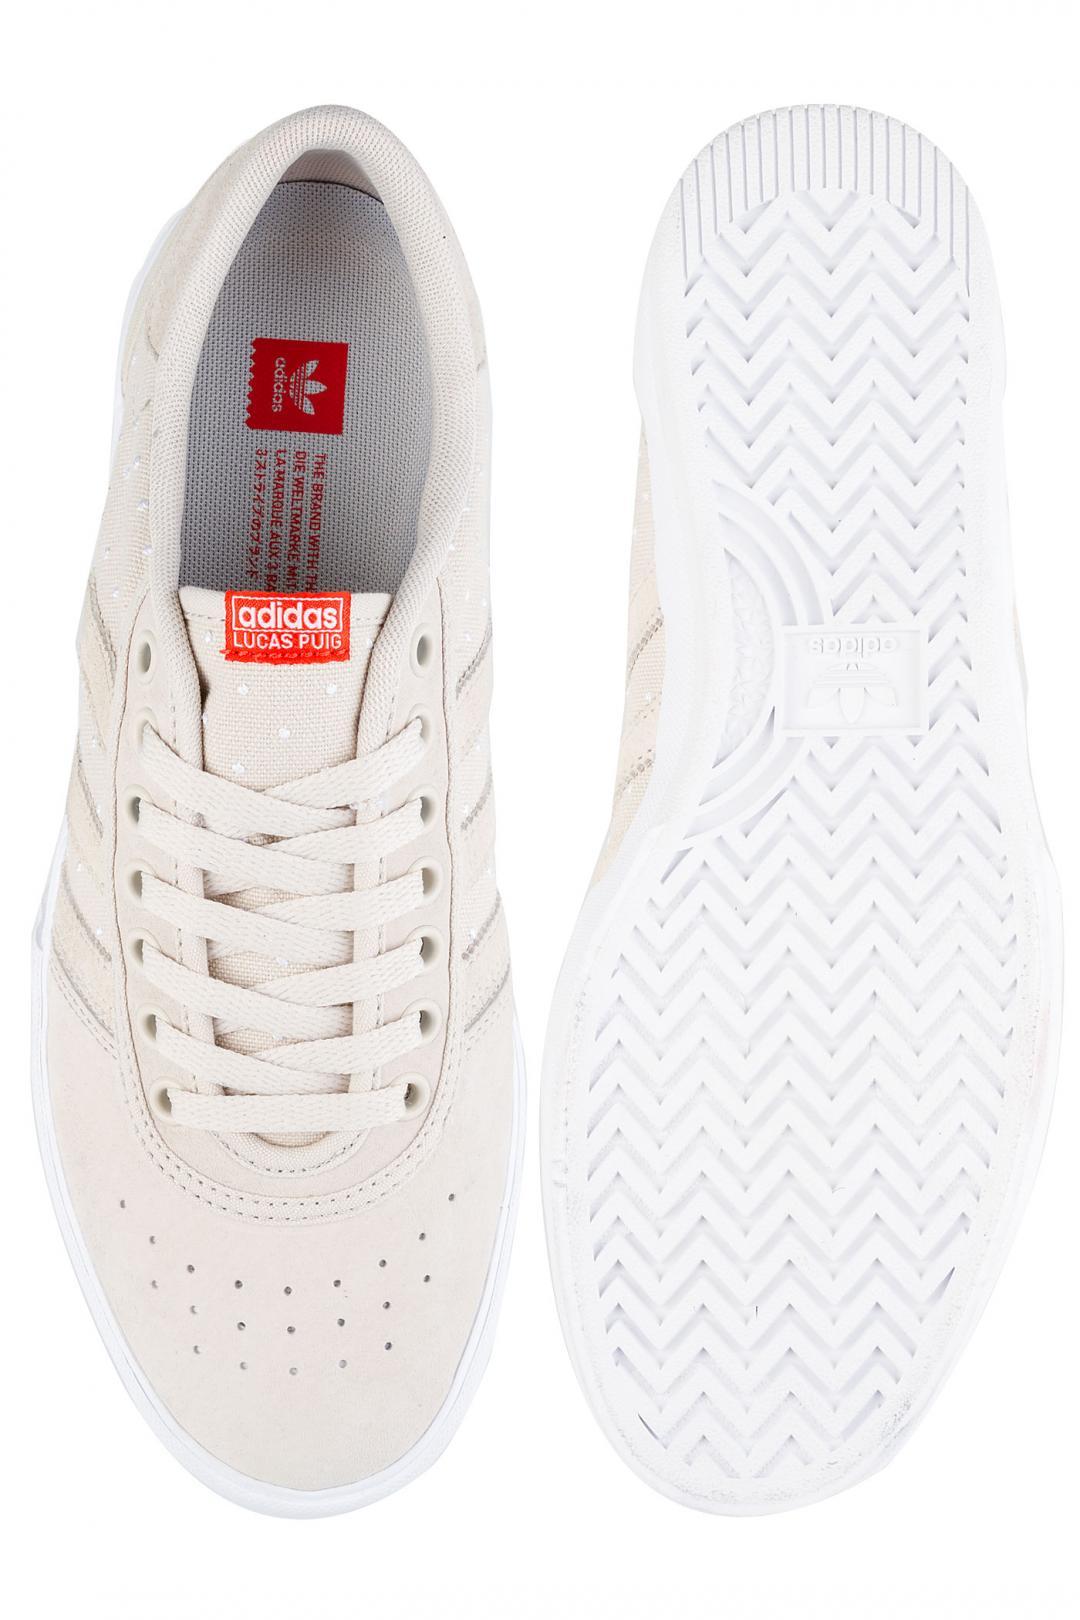 Uomo adidas Skateboarding Lucas Premiere clear brown white active red | Scarpe da skate